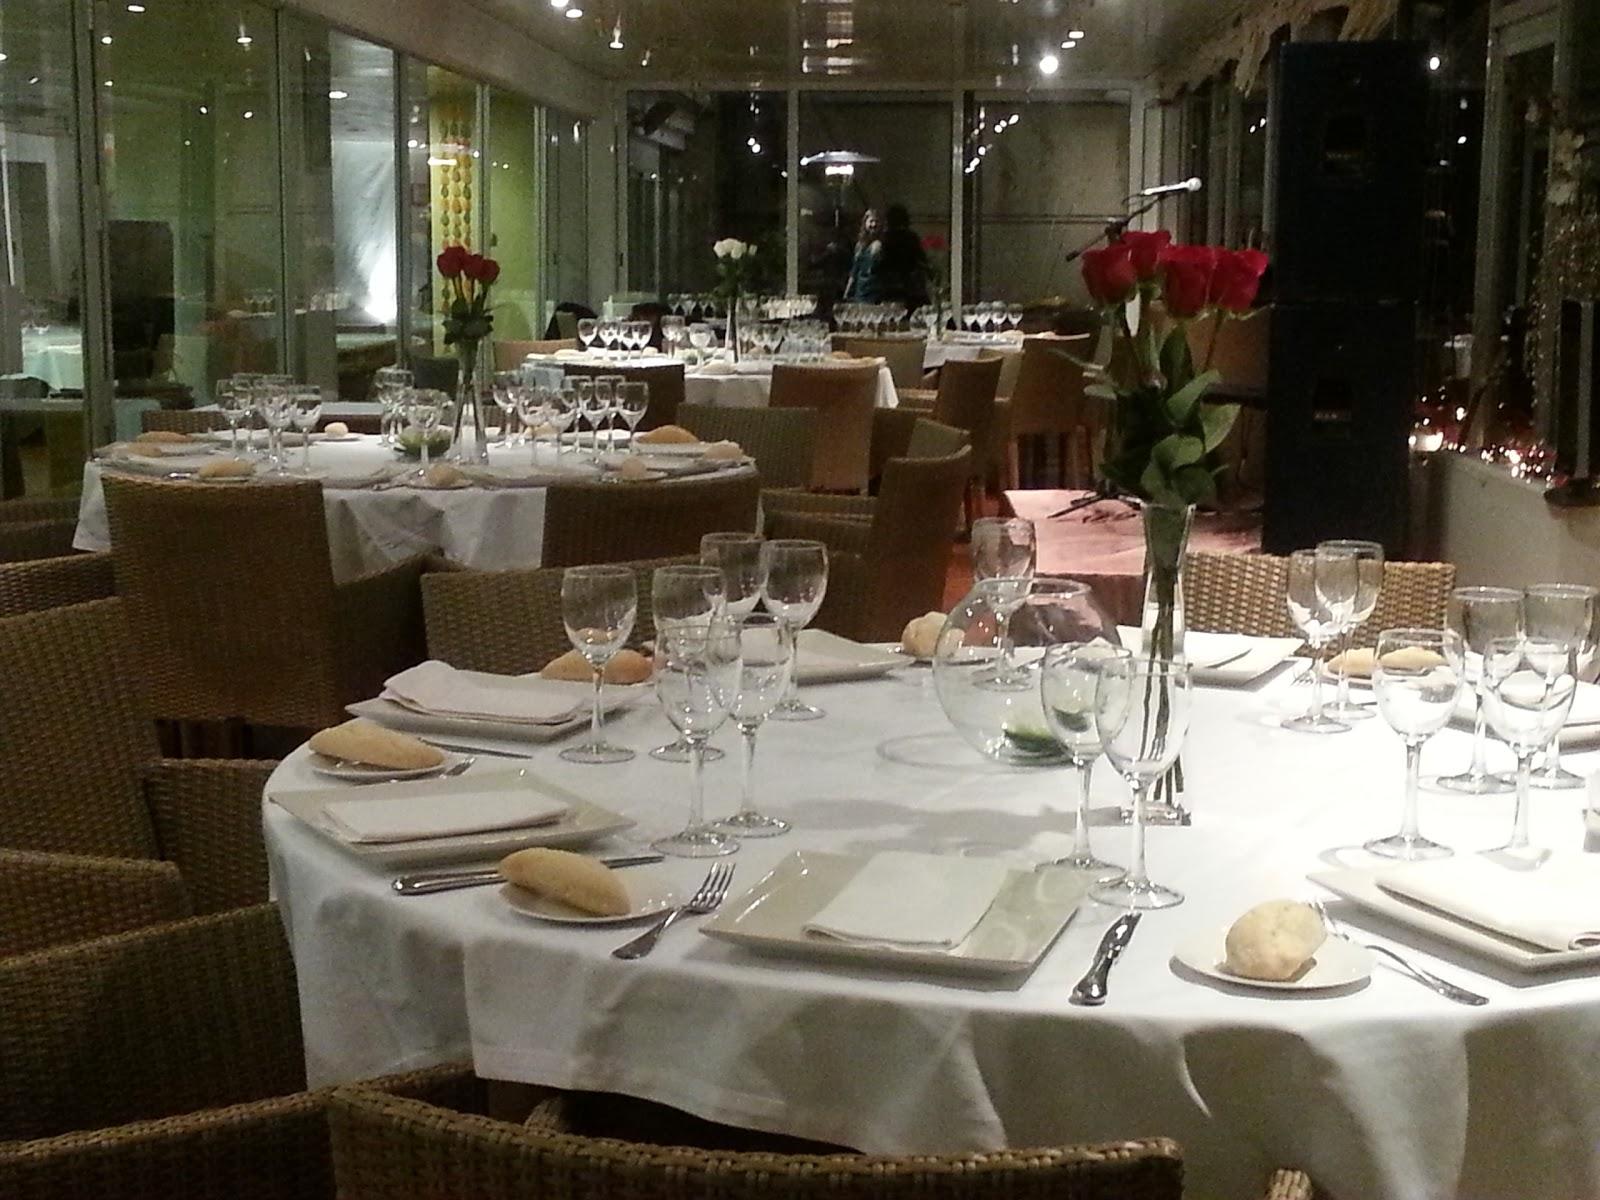 restaurante en madrid centro